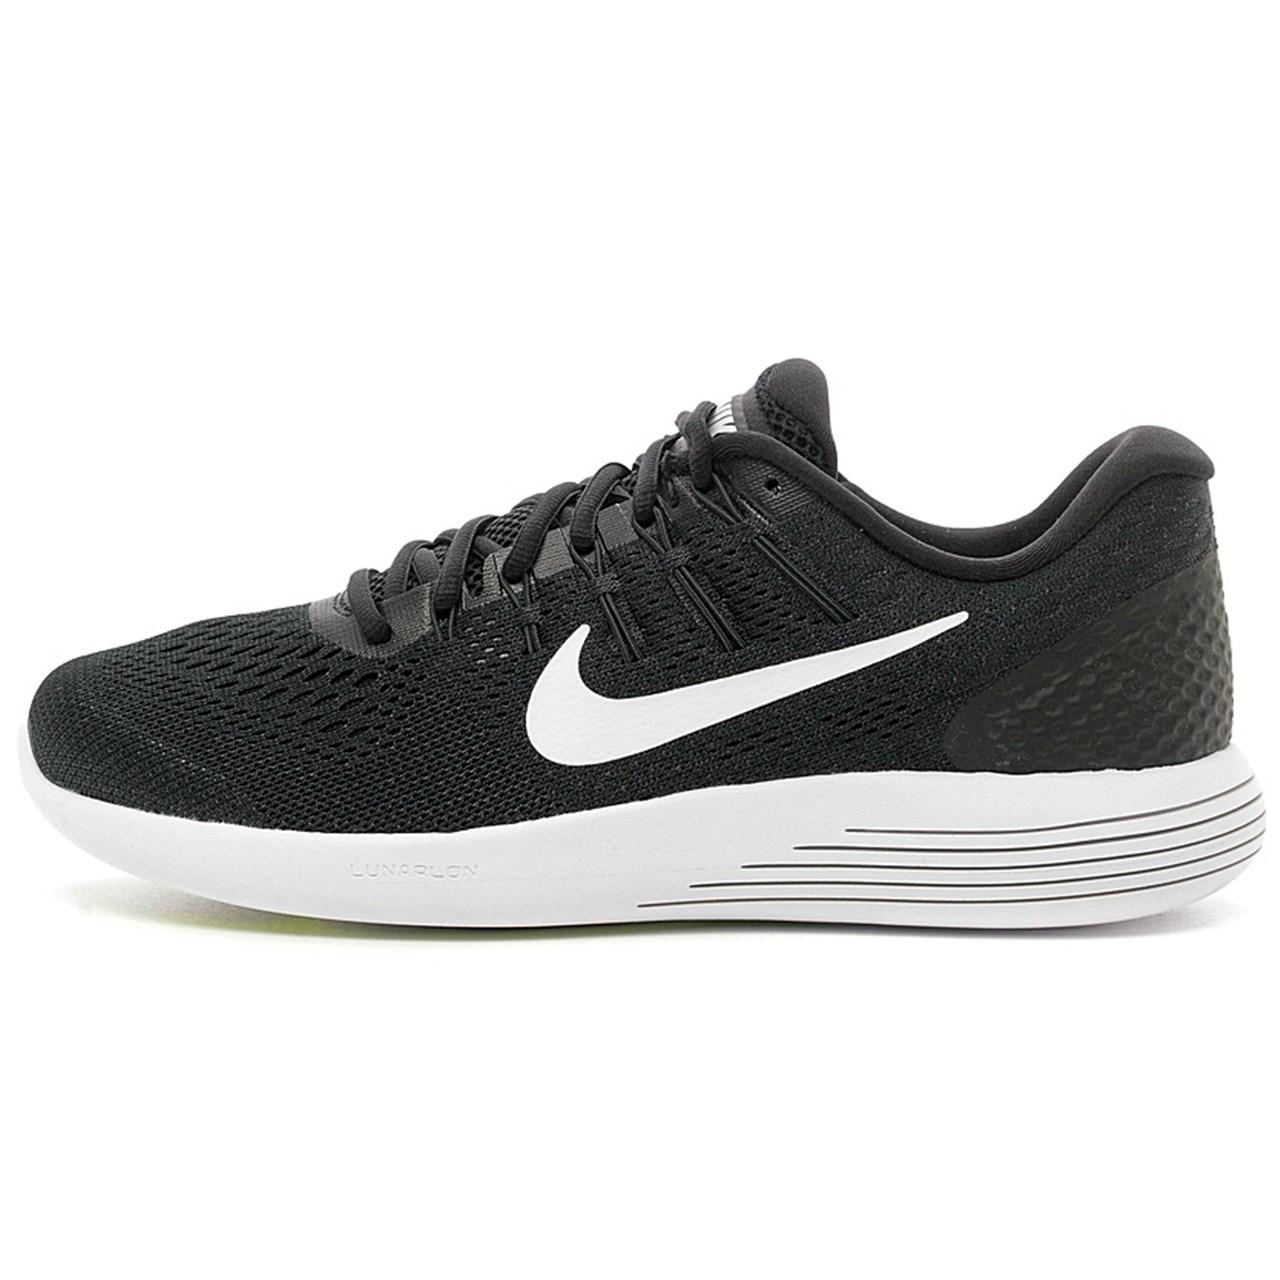 کفش مخصوص دویدن زنانه نایکی مدل Lunarglide 8